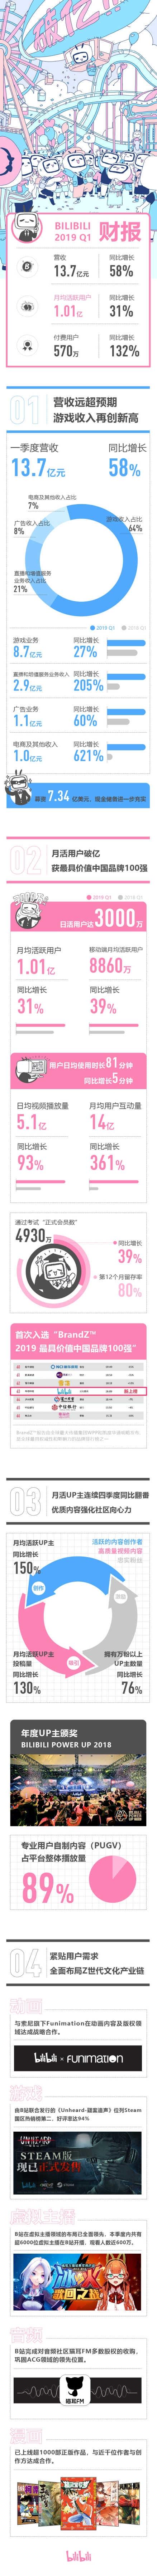 B站发布2019年Q1财报:营收13.7亿元 月活跃用